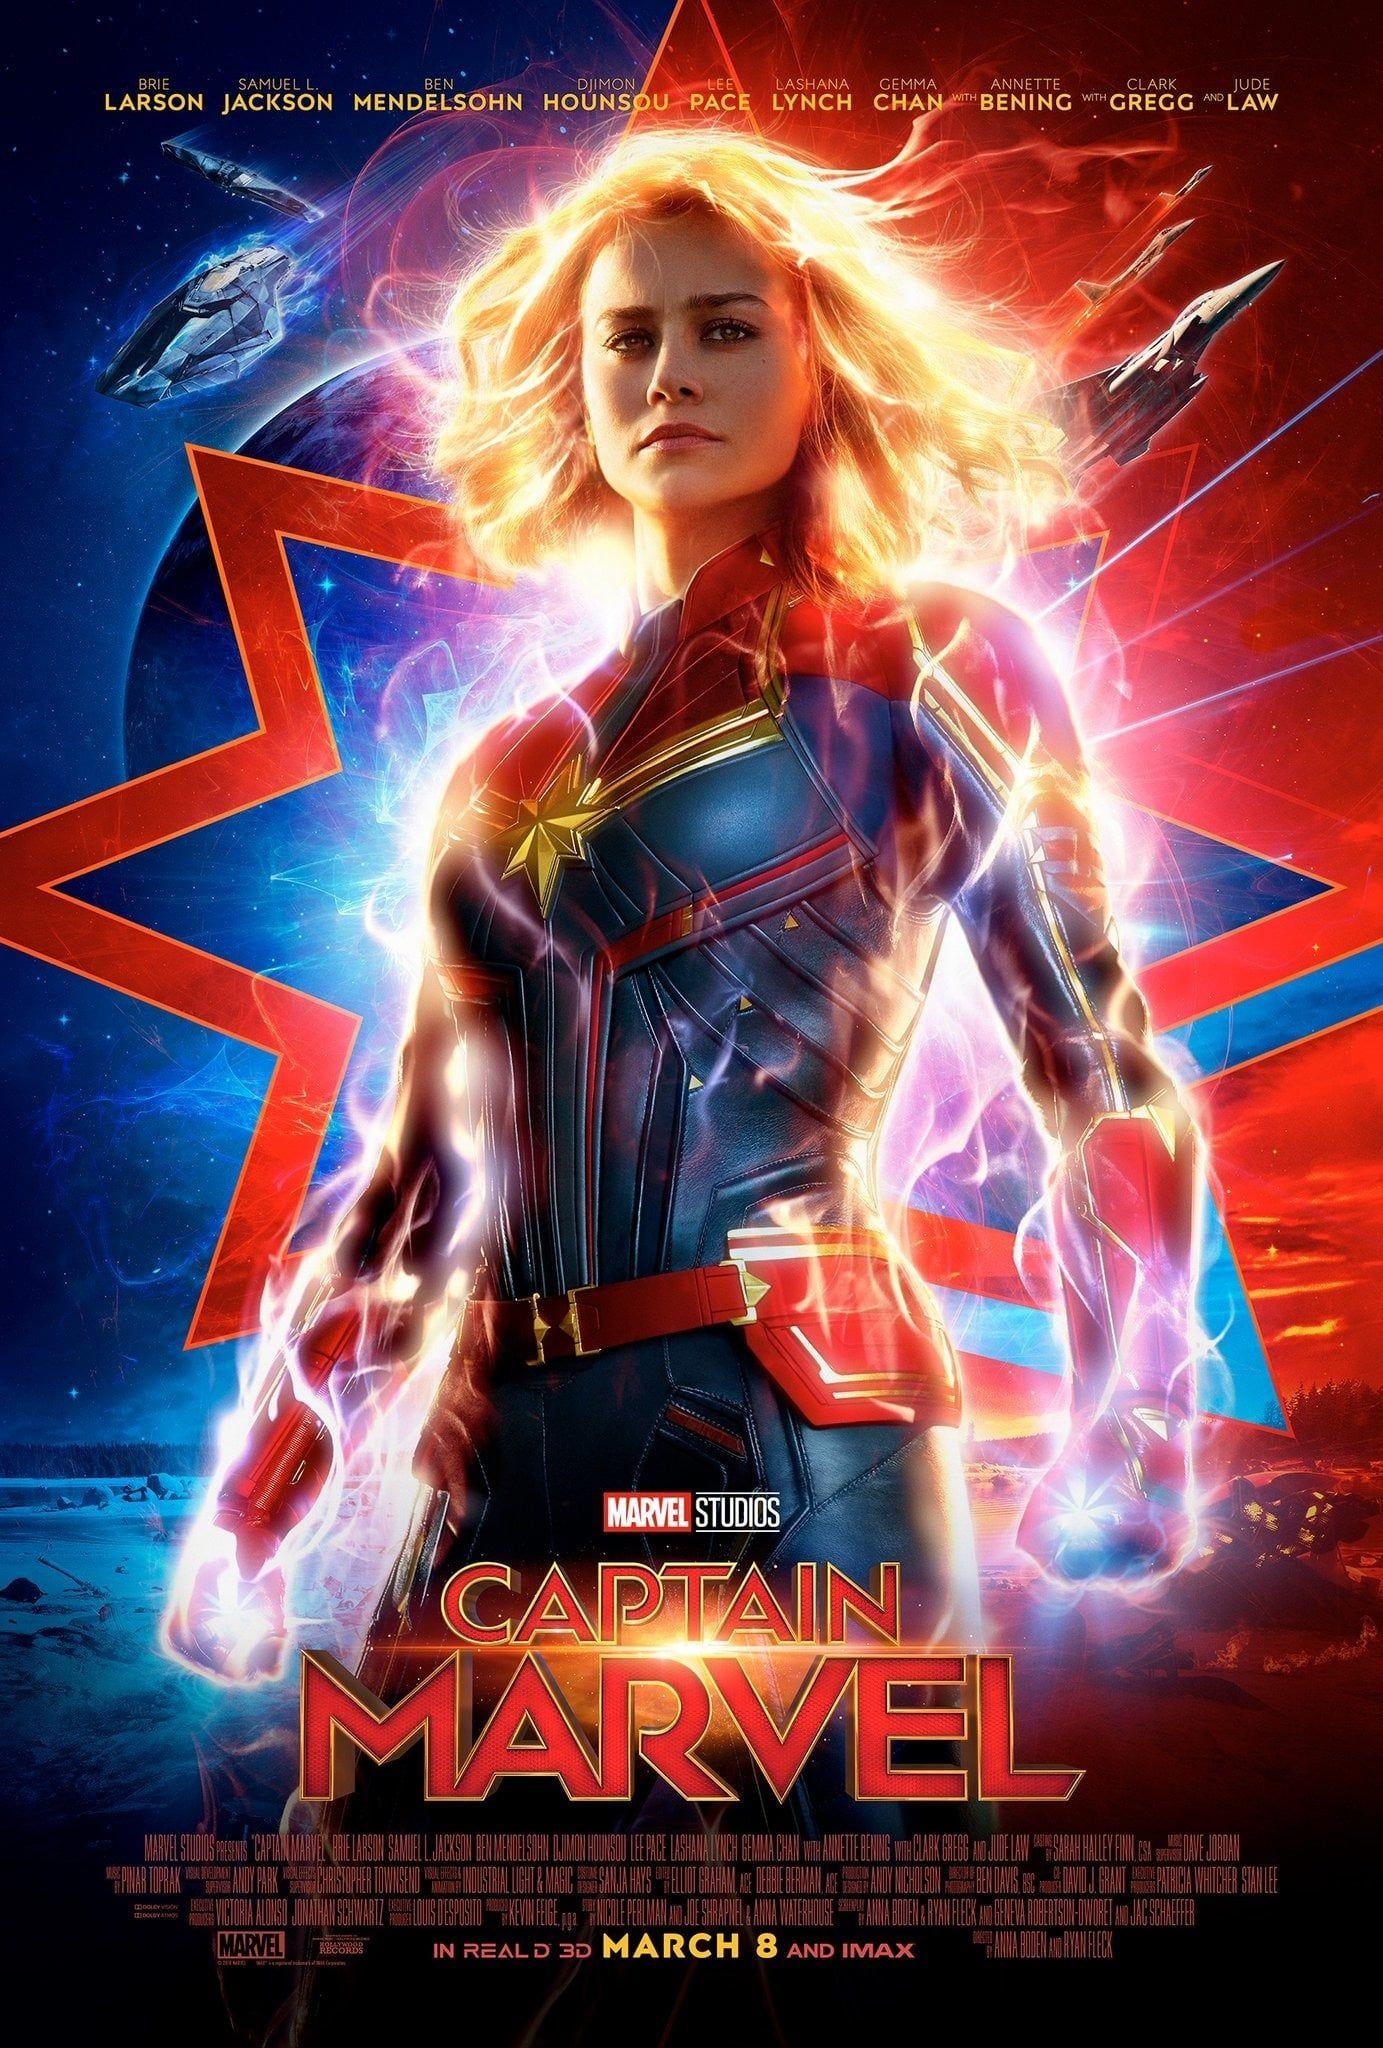 Ver Hd Online Captain Marvel P E L I C U L A Completa Espanol Latino Hd 1080p Ultrapeliculashd C Captain Marvel Trailer Marvel Movie Posters Marvel Films